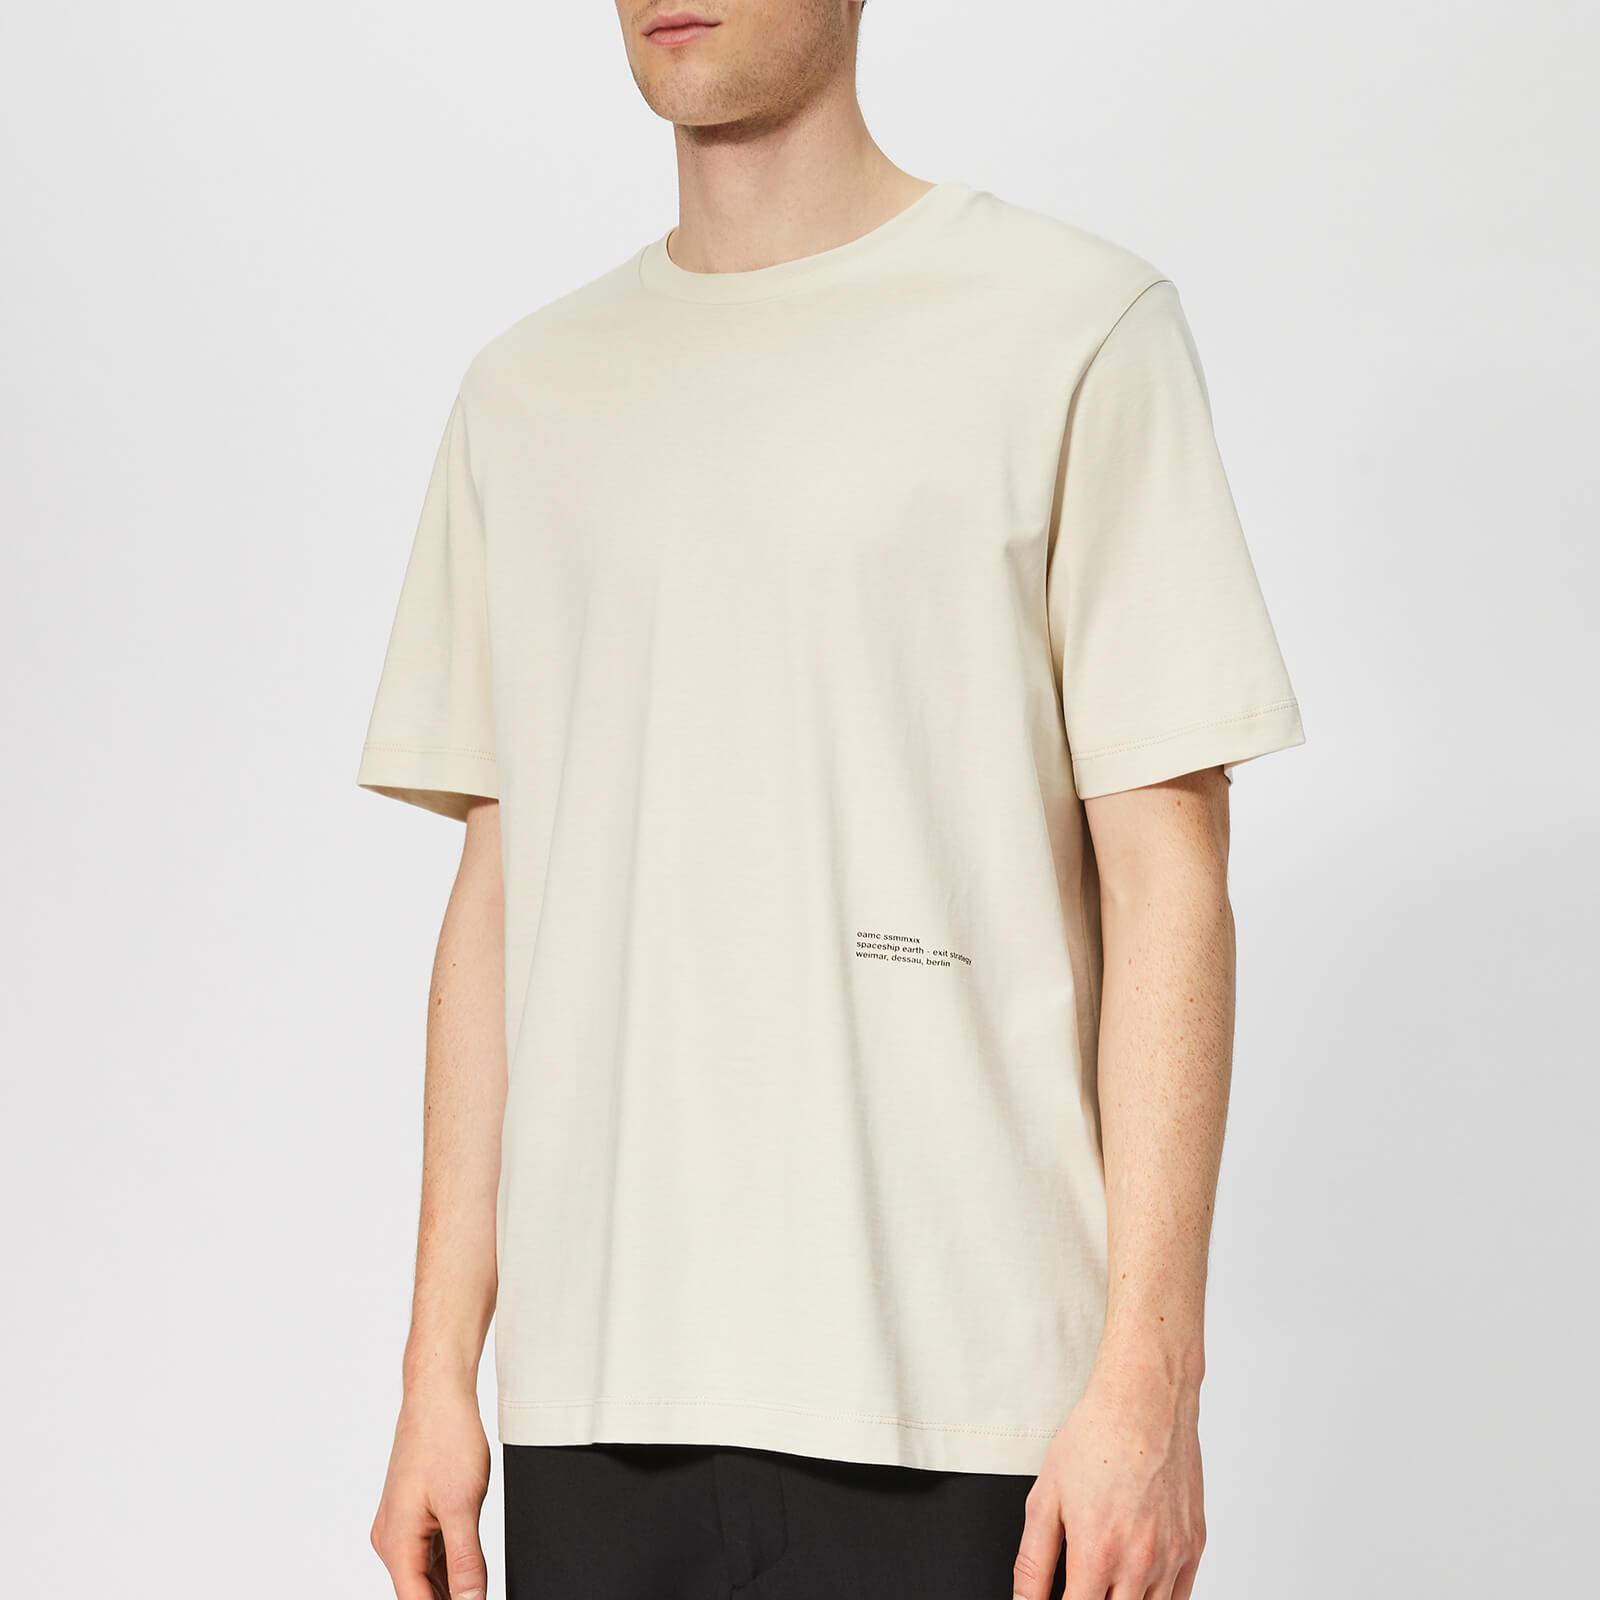 b93338566 OAMC Men's SE T-Shirt - Light Pastel Green - Free UK Delivery over £50